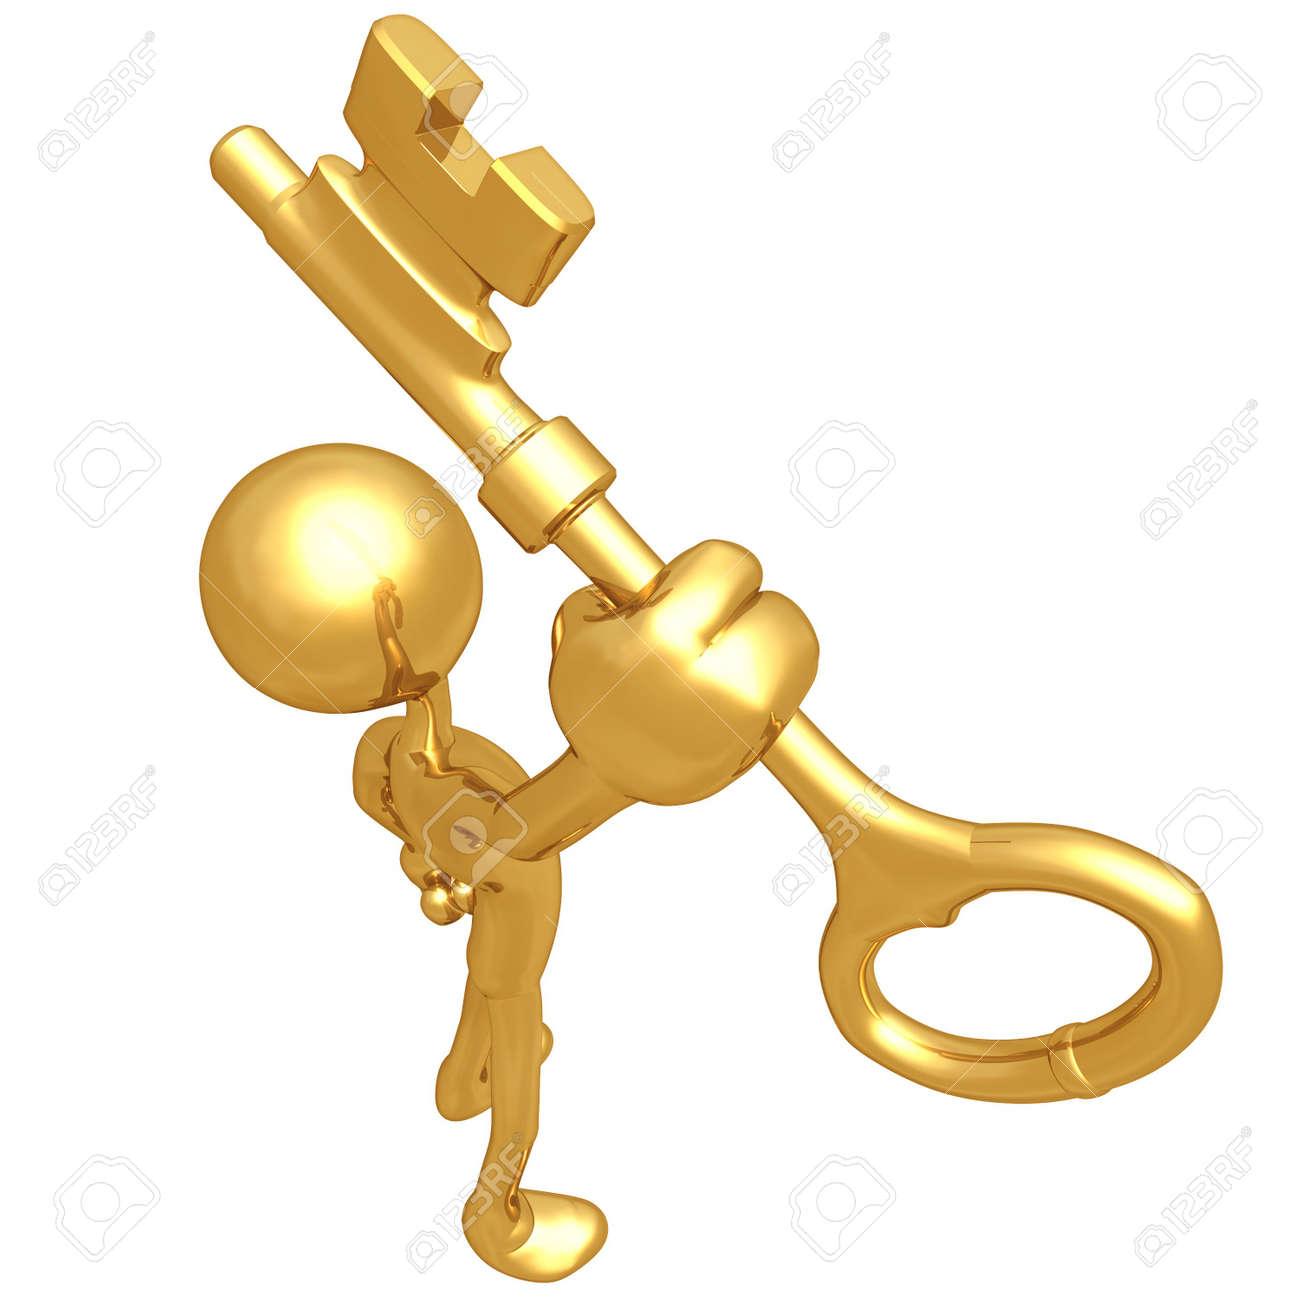 Holding The Golden Key Stock Photo - 4759203